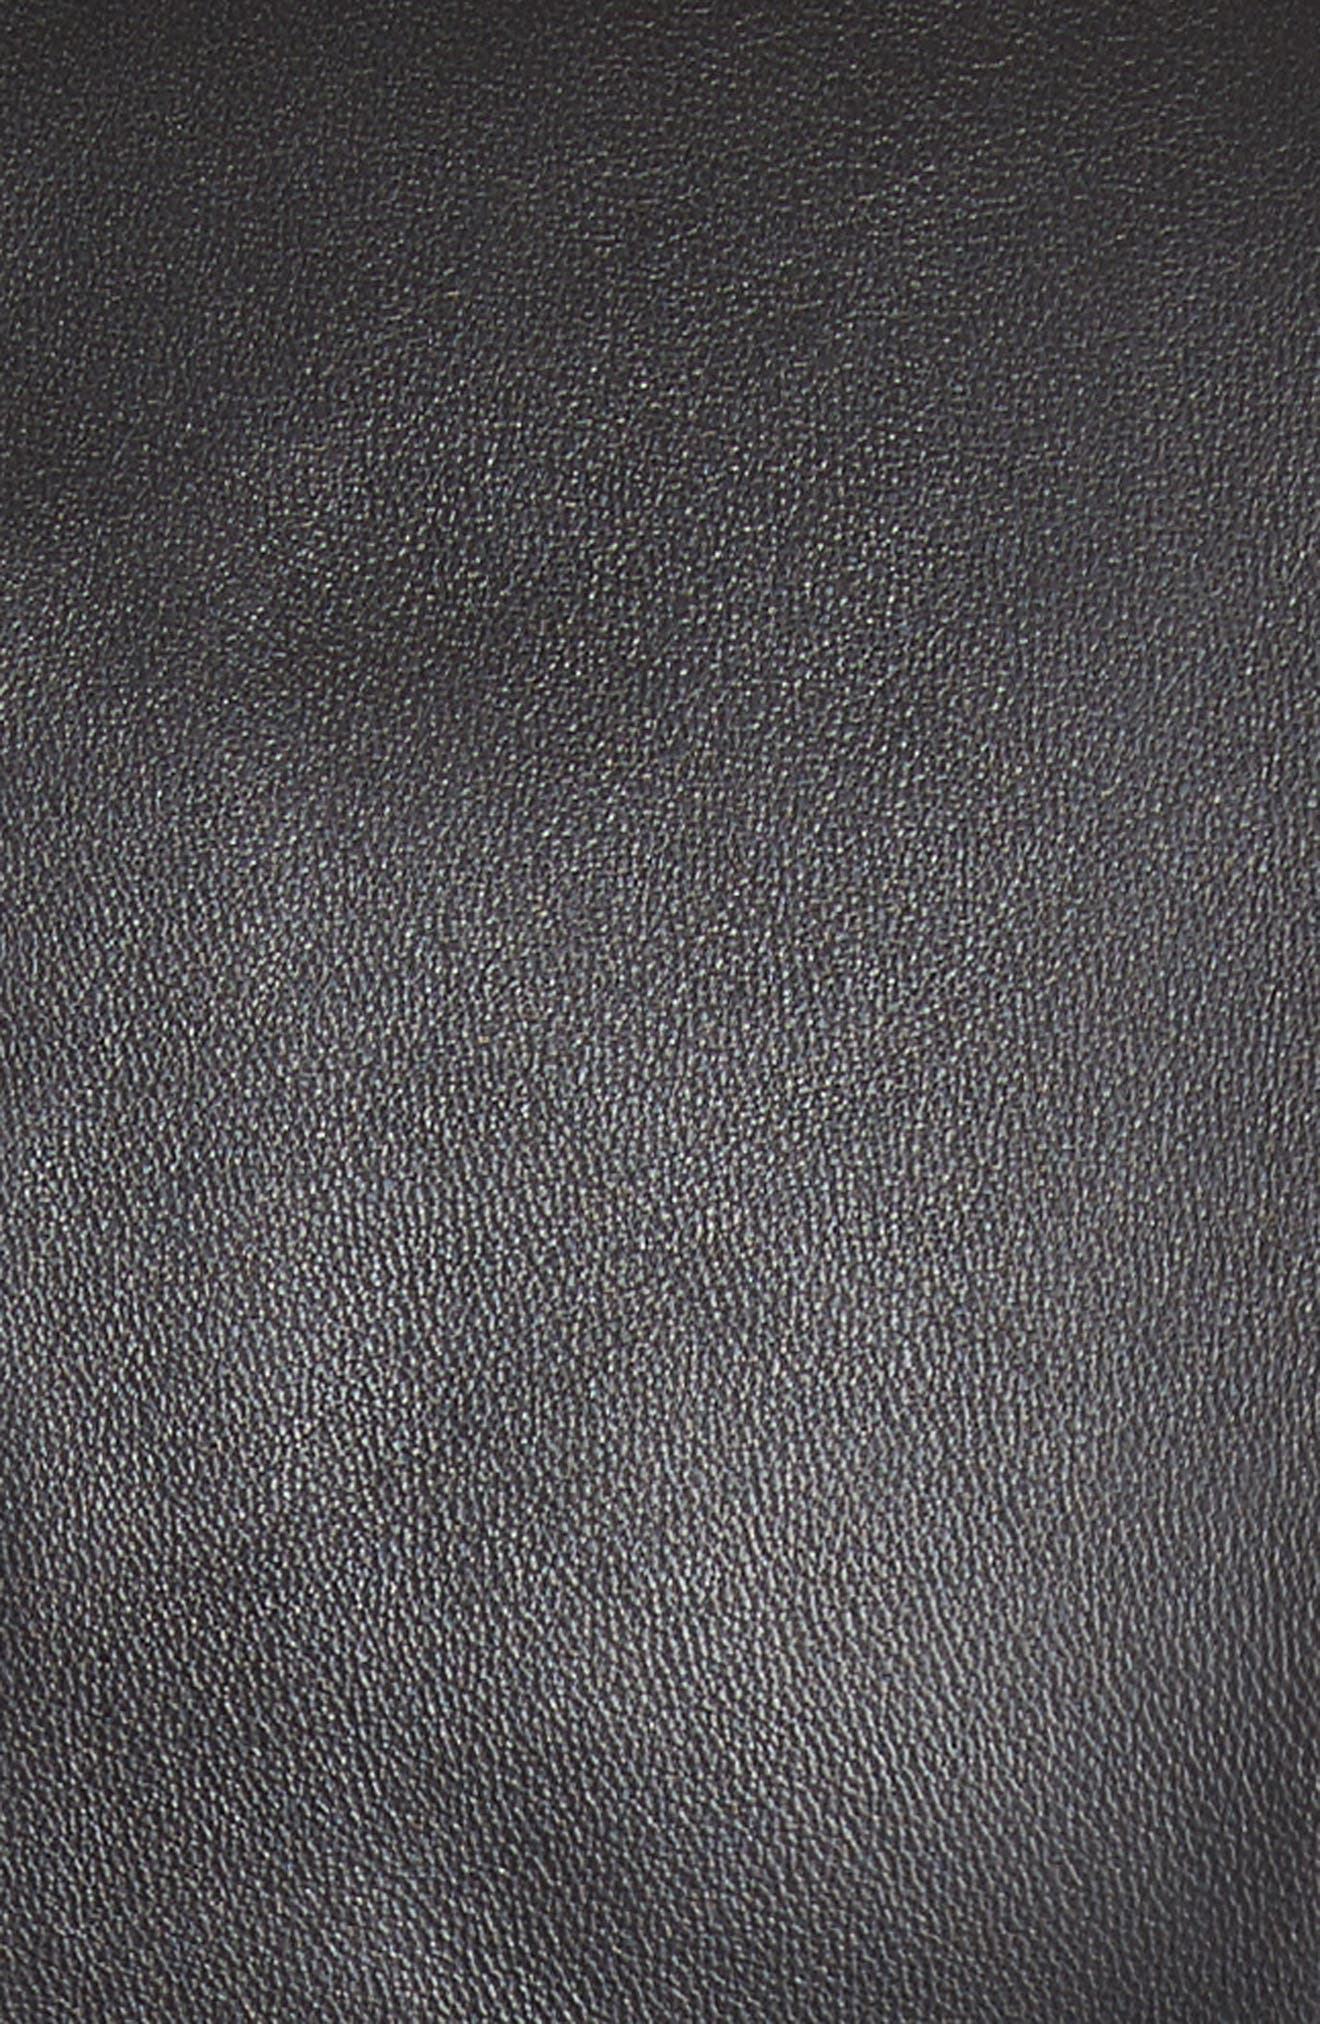 Plongé Leather Jacket,                             Alternate thumbnail 6, color,                             BLACK